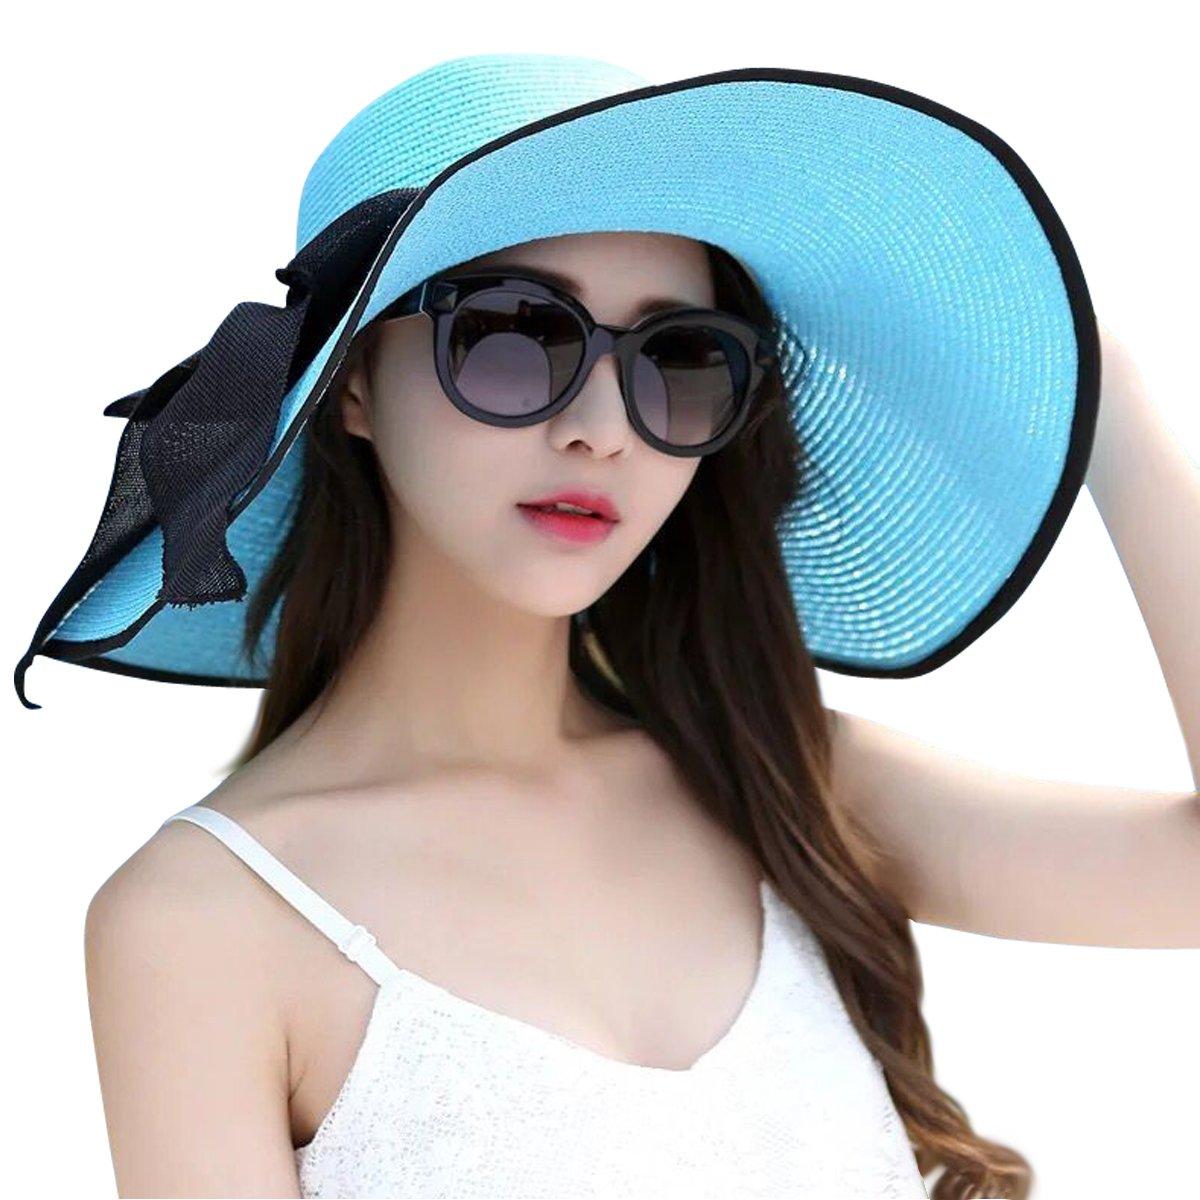 Lanzom Womens Big Bowknot Straw Hat Foldable Roll up Sun Hat Beach Cap UPF 50+ hat0571